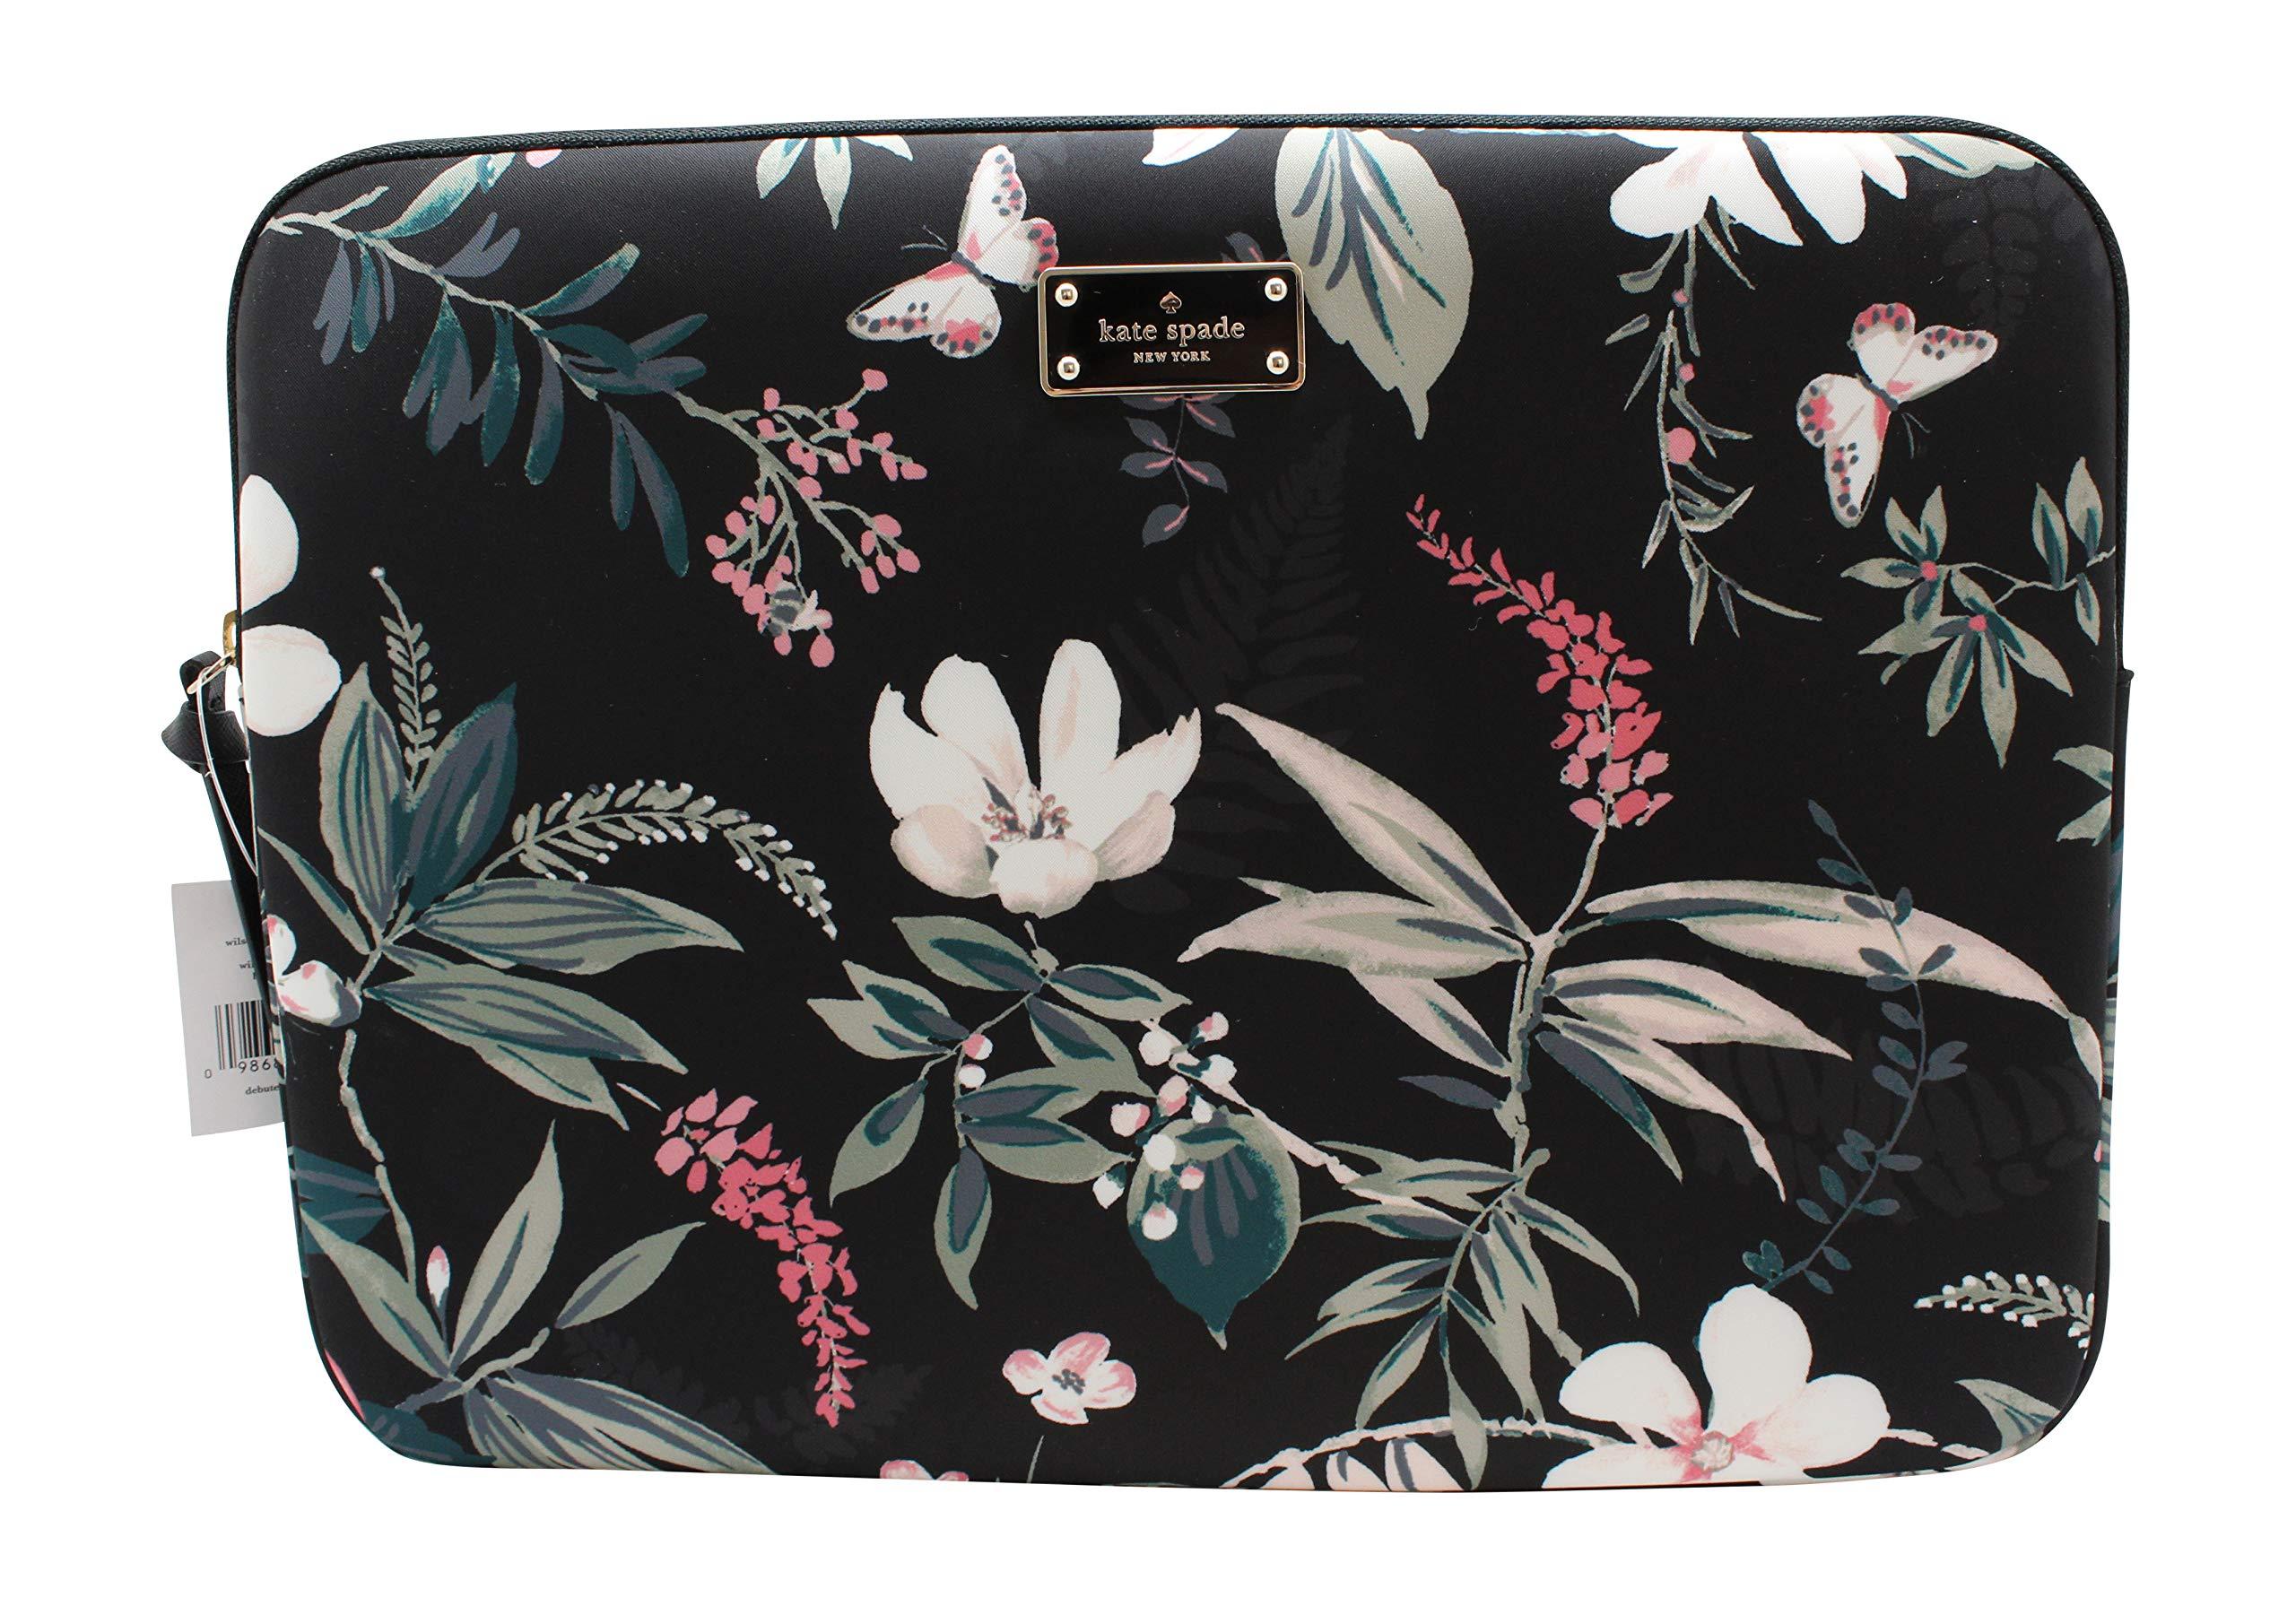 Kate Spade Wilson Rd Botanical Laptop Case Sleeve Black Multi 13'' by Kate Spade New York (Image #1)